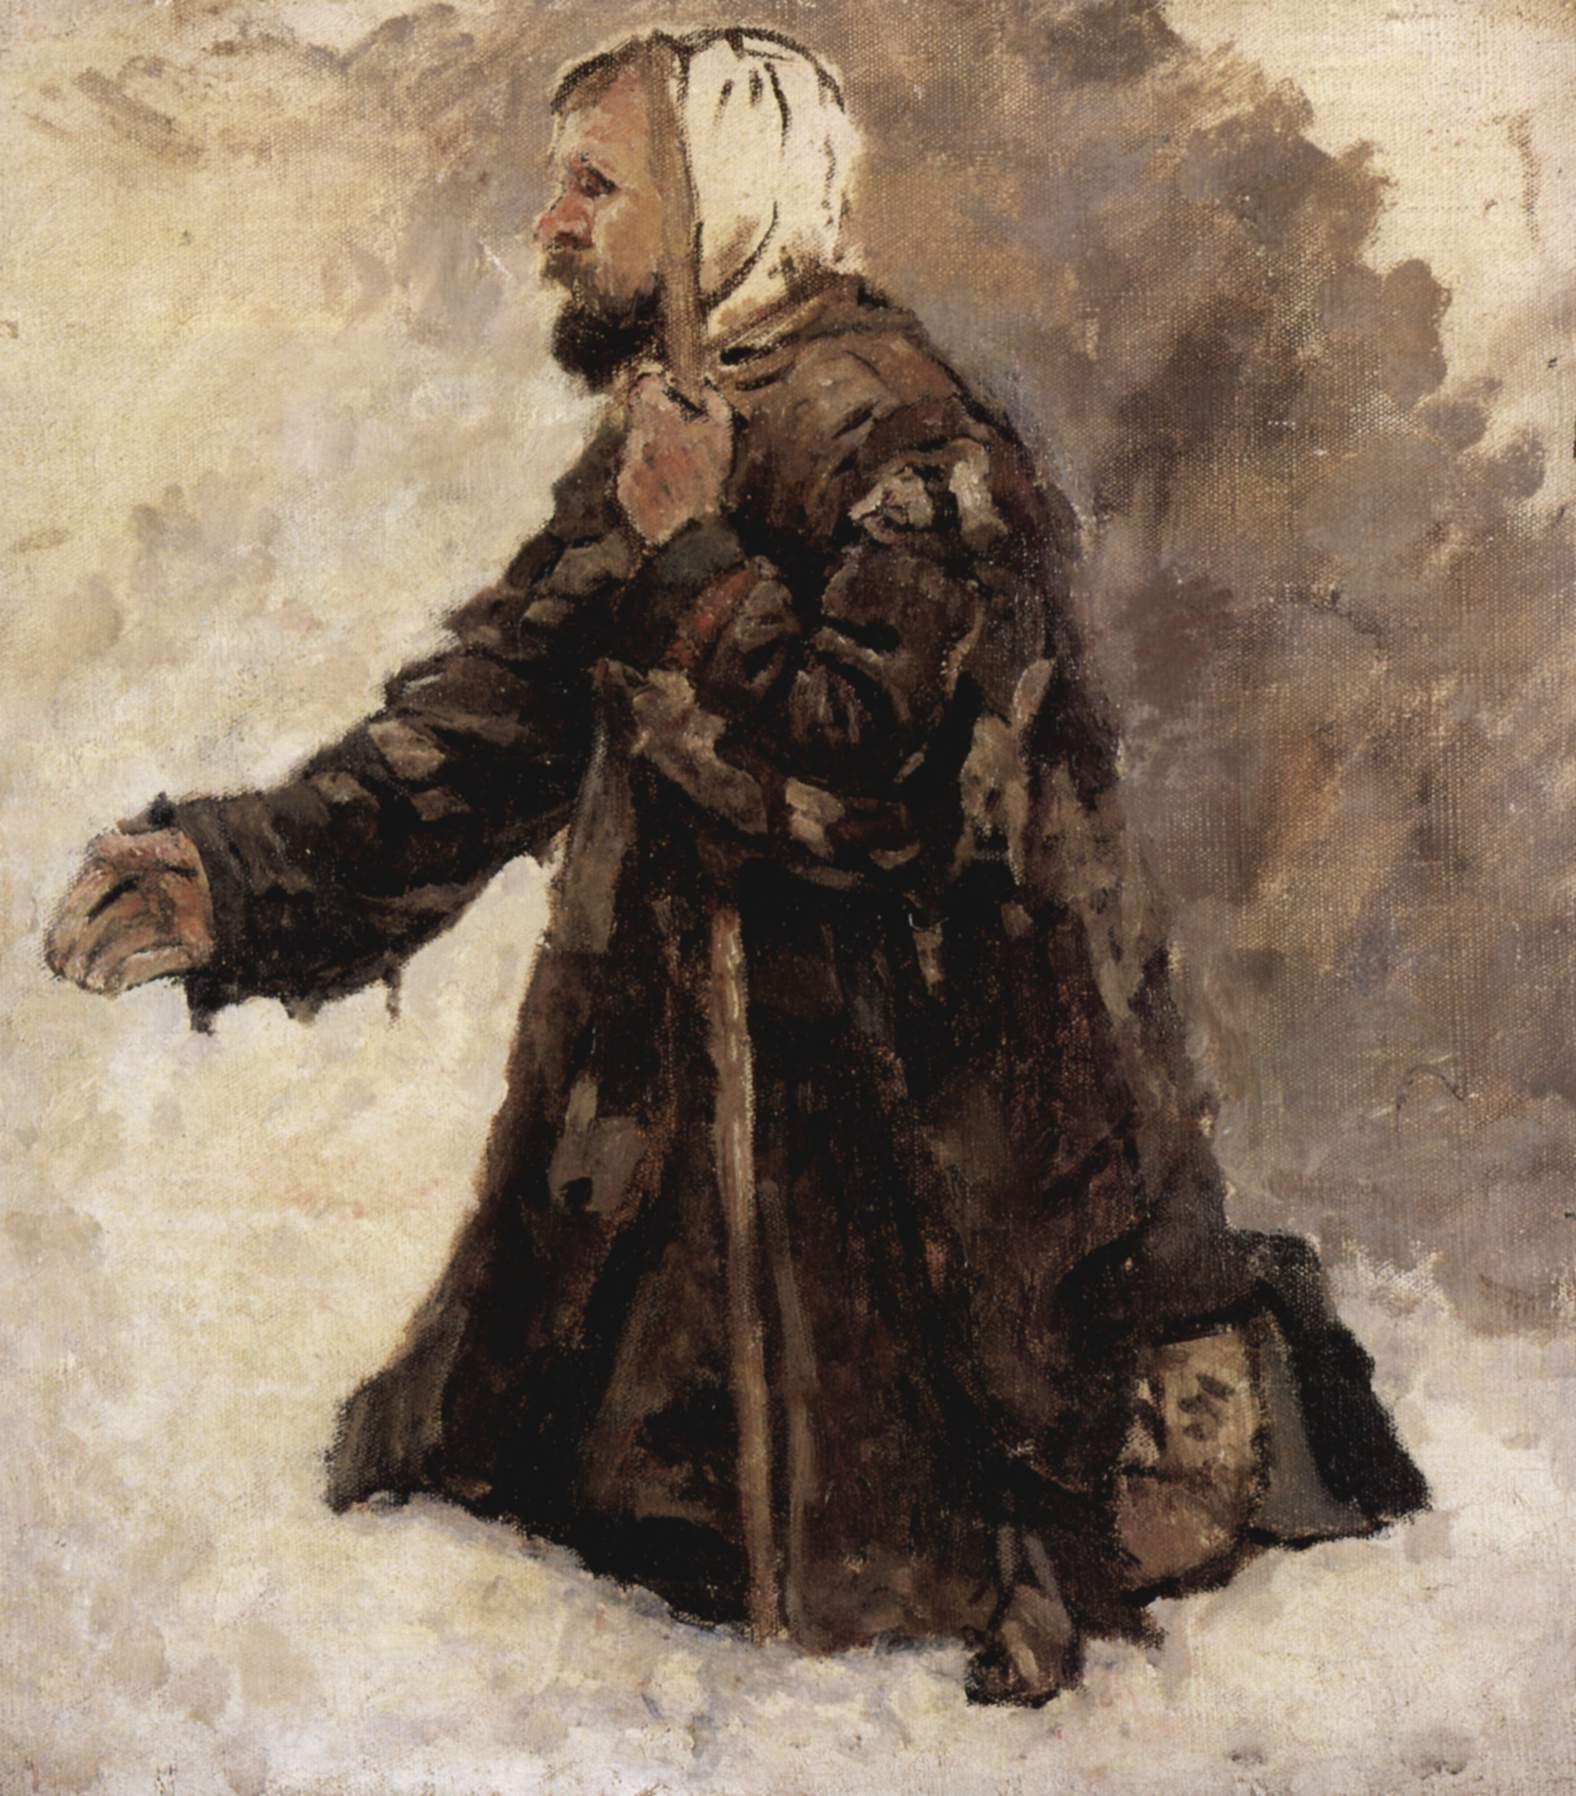 https://upload.wikimedia.org/wikipedia/commons/3/3c/Boyaryna_Morozova_by_V.Surikov_-_sketch_02_%28Russian_museum%29.jpg